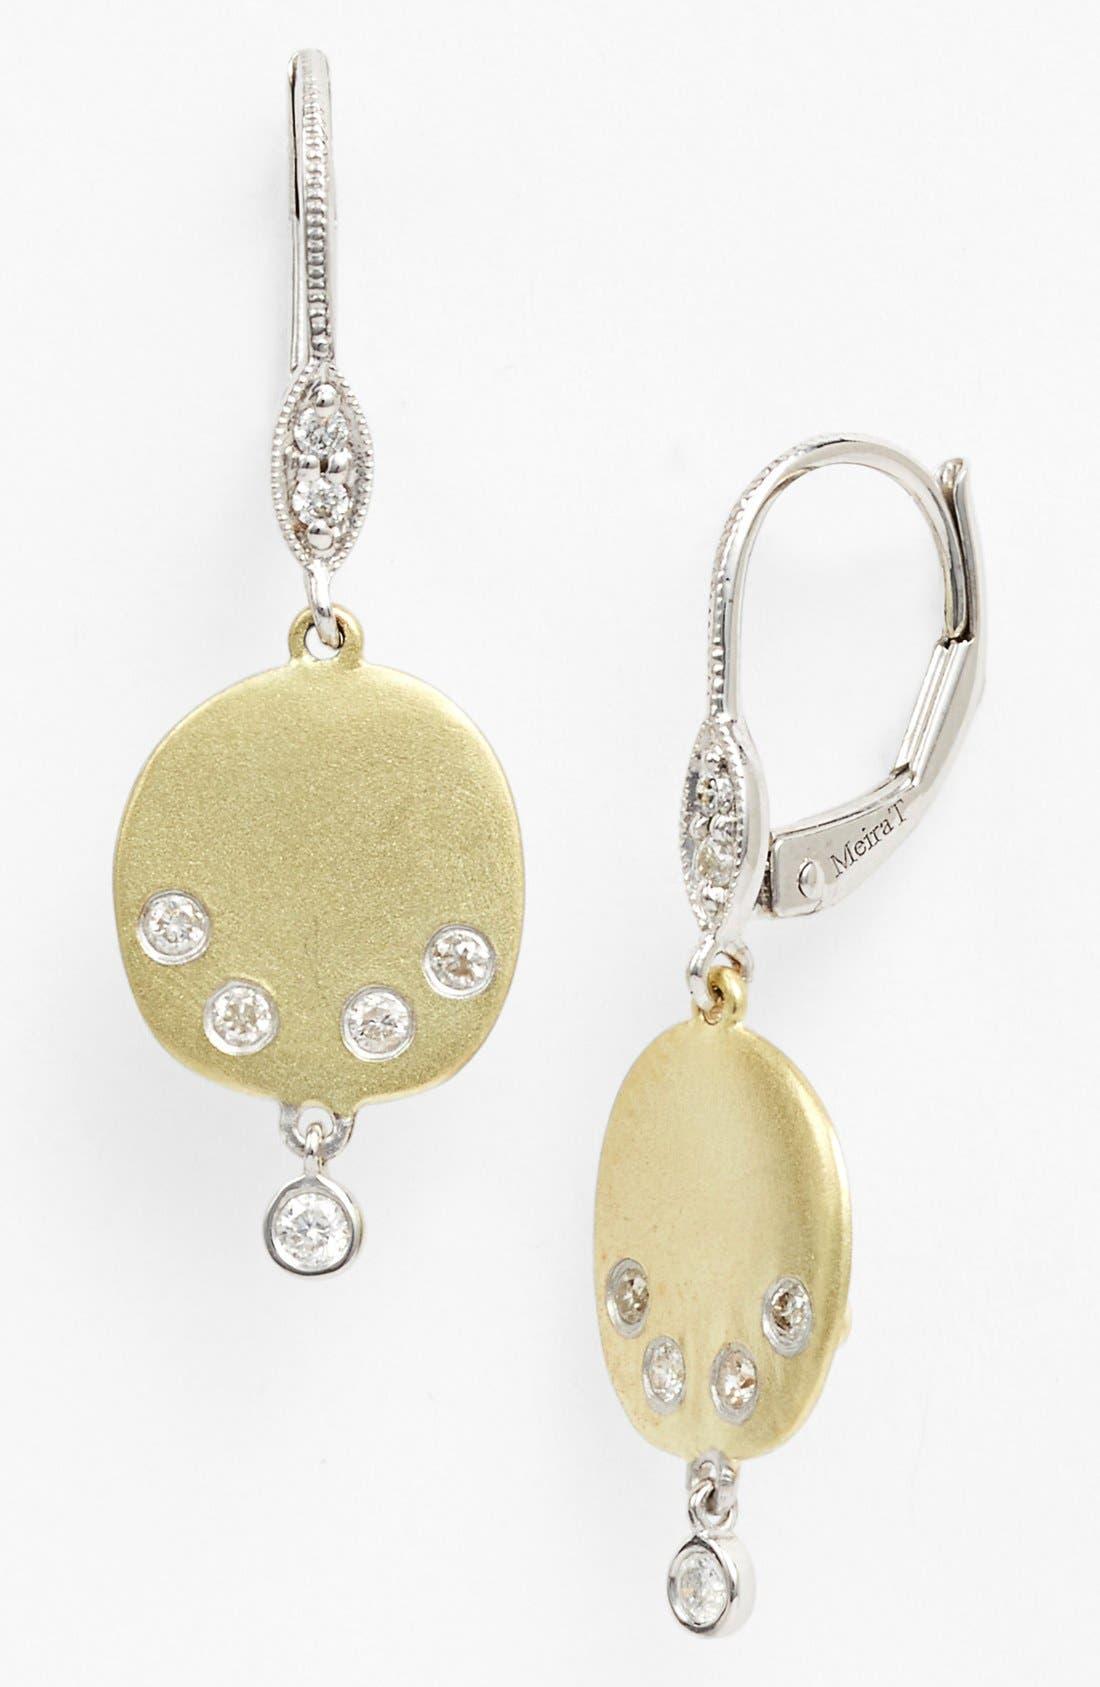 Main Image - MeiraT 'Charmed' Diamond Drop Earrings